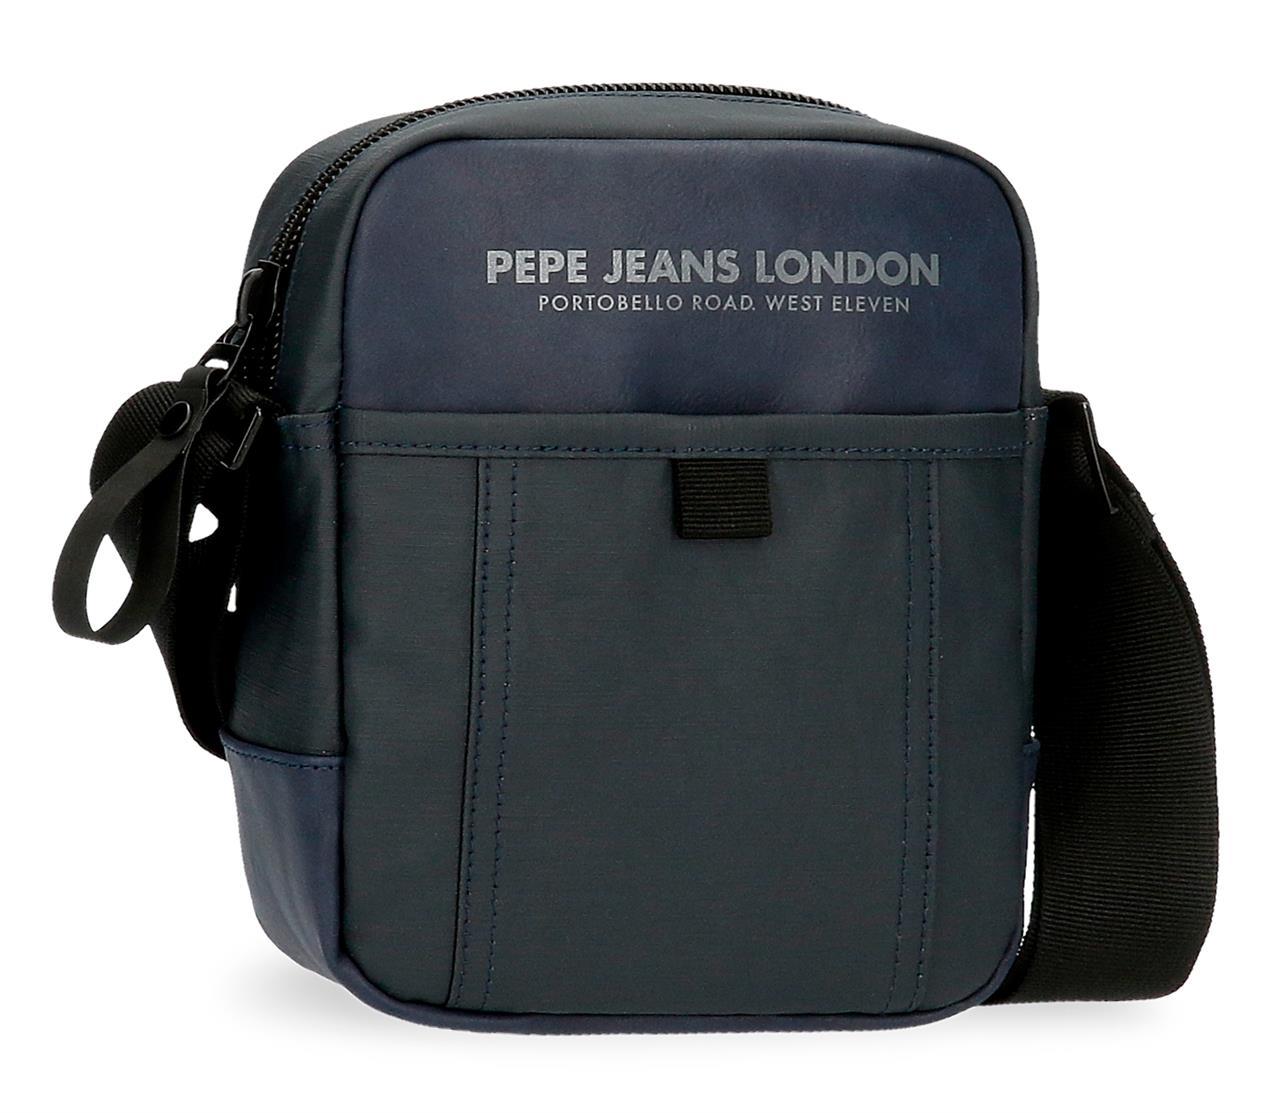 7375021 Bandolera 19 cm Pepe Jeans Factory